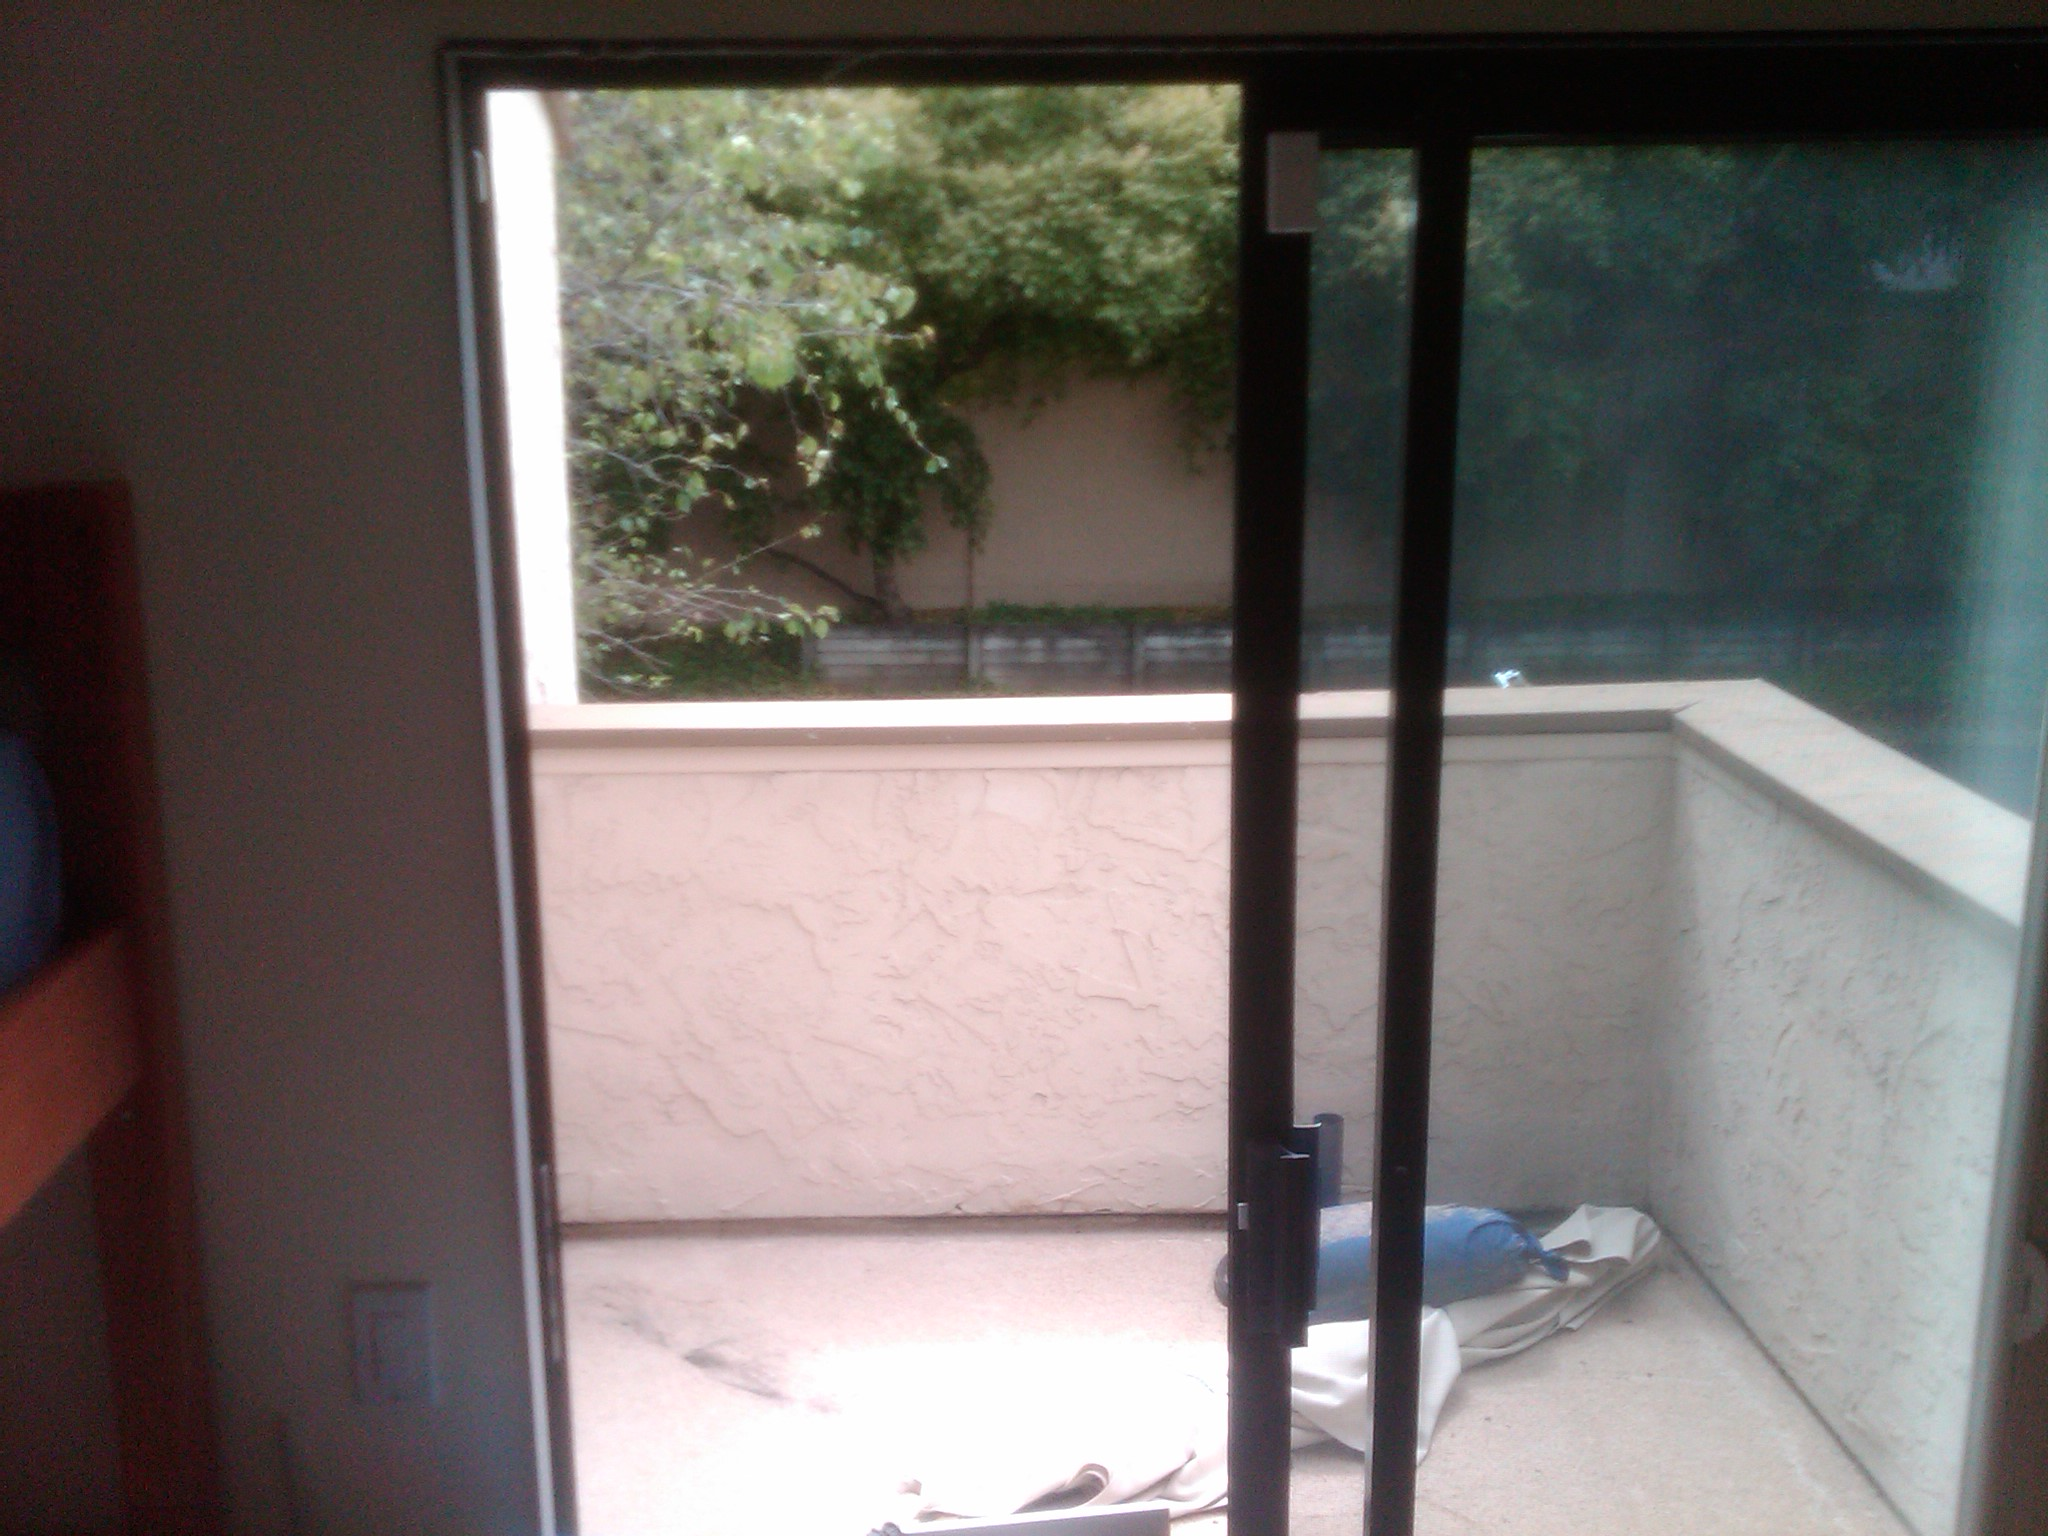 Waterproofing Decks Over Living Areas : Failed waterproof decks golden gate enterprises bay area